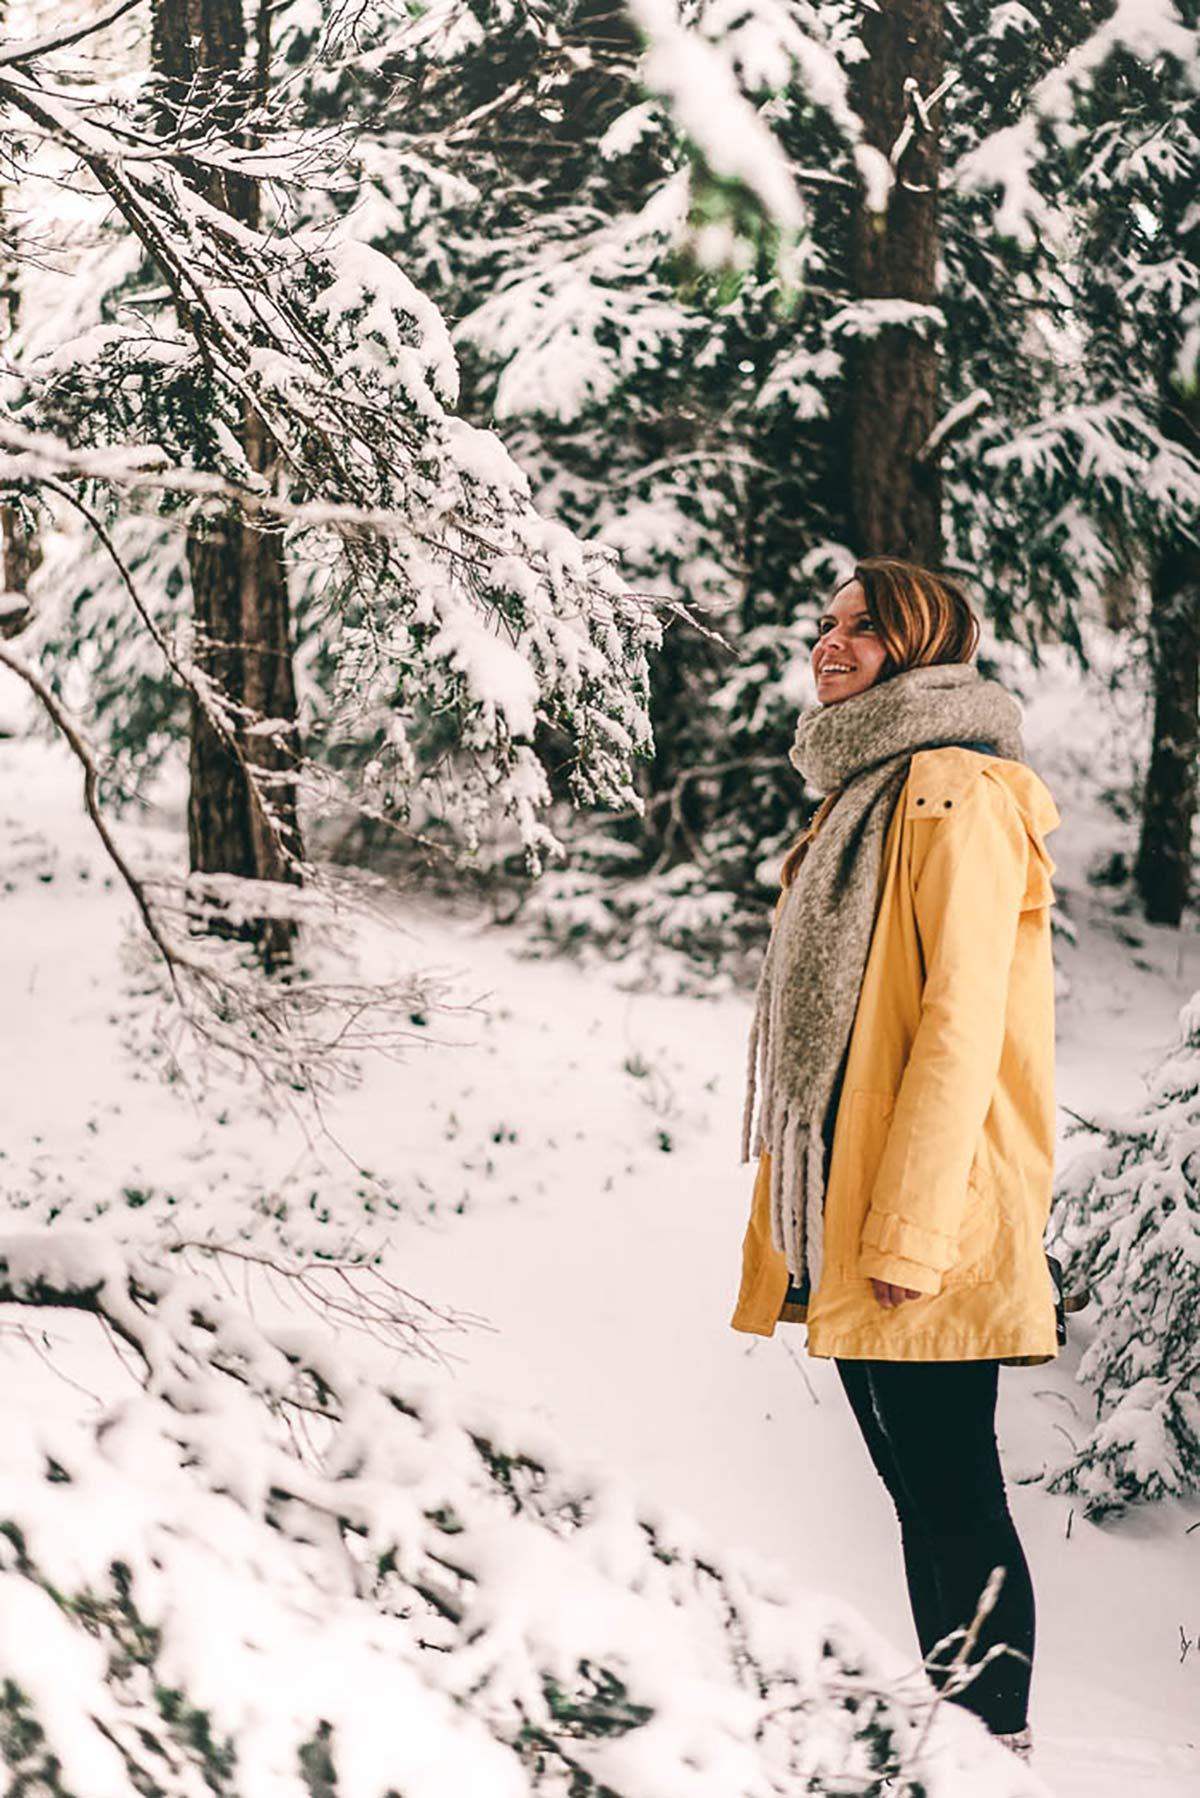 Wald Winter Christine Neder